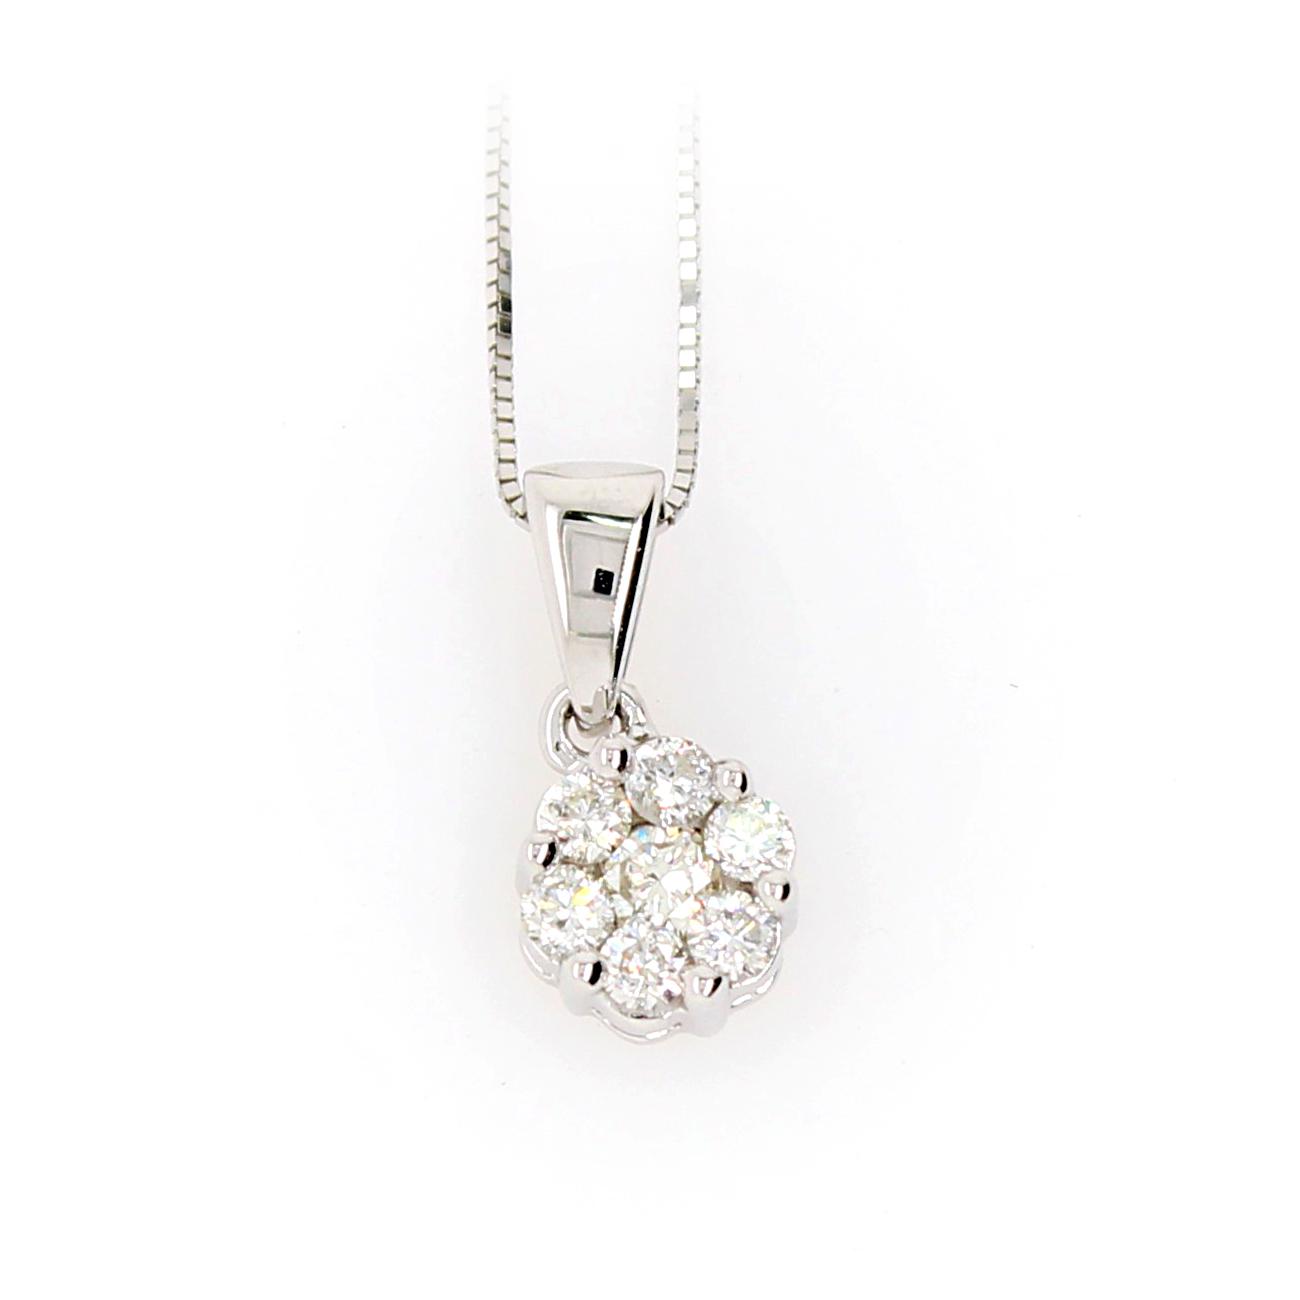 Shefi Diamonds 10 Karat White Gold Cluster Diamond Pendant Necklace